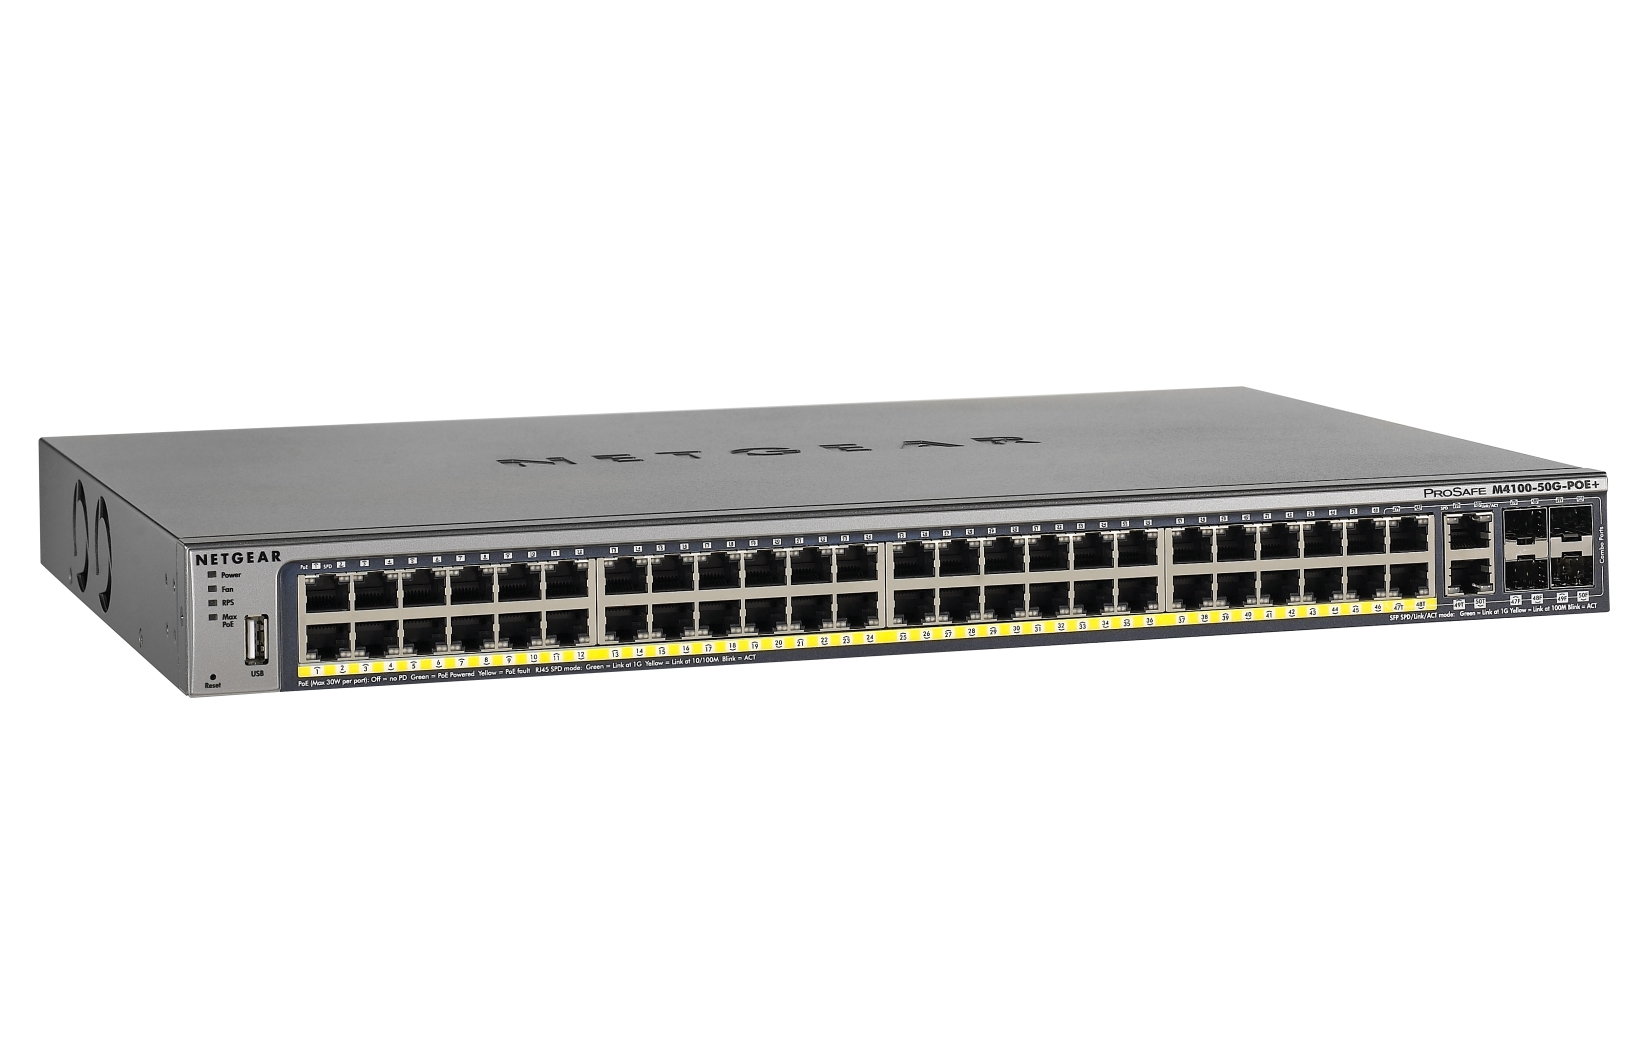 Netgear M4100-50G-POE+ gemanaged L2+ Gigabit Ethernet (10/100/1000) Energie Über Ethernet (PoE) Unterstützung Grau